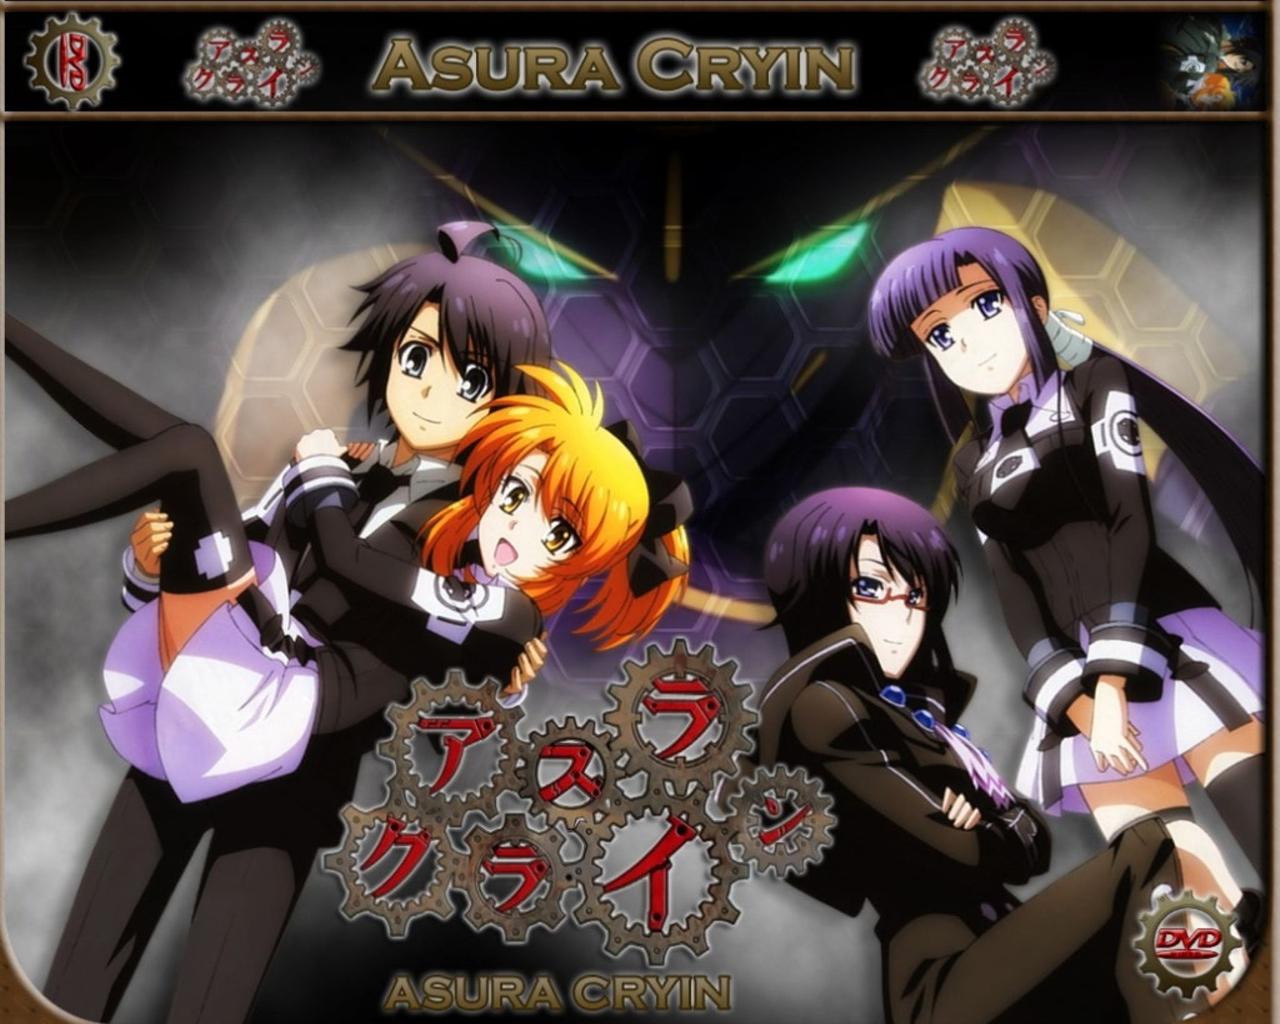 Moonlight Summoners Anime Sekai Asura Cryin アスラク